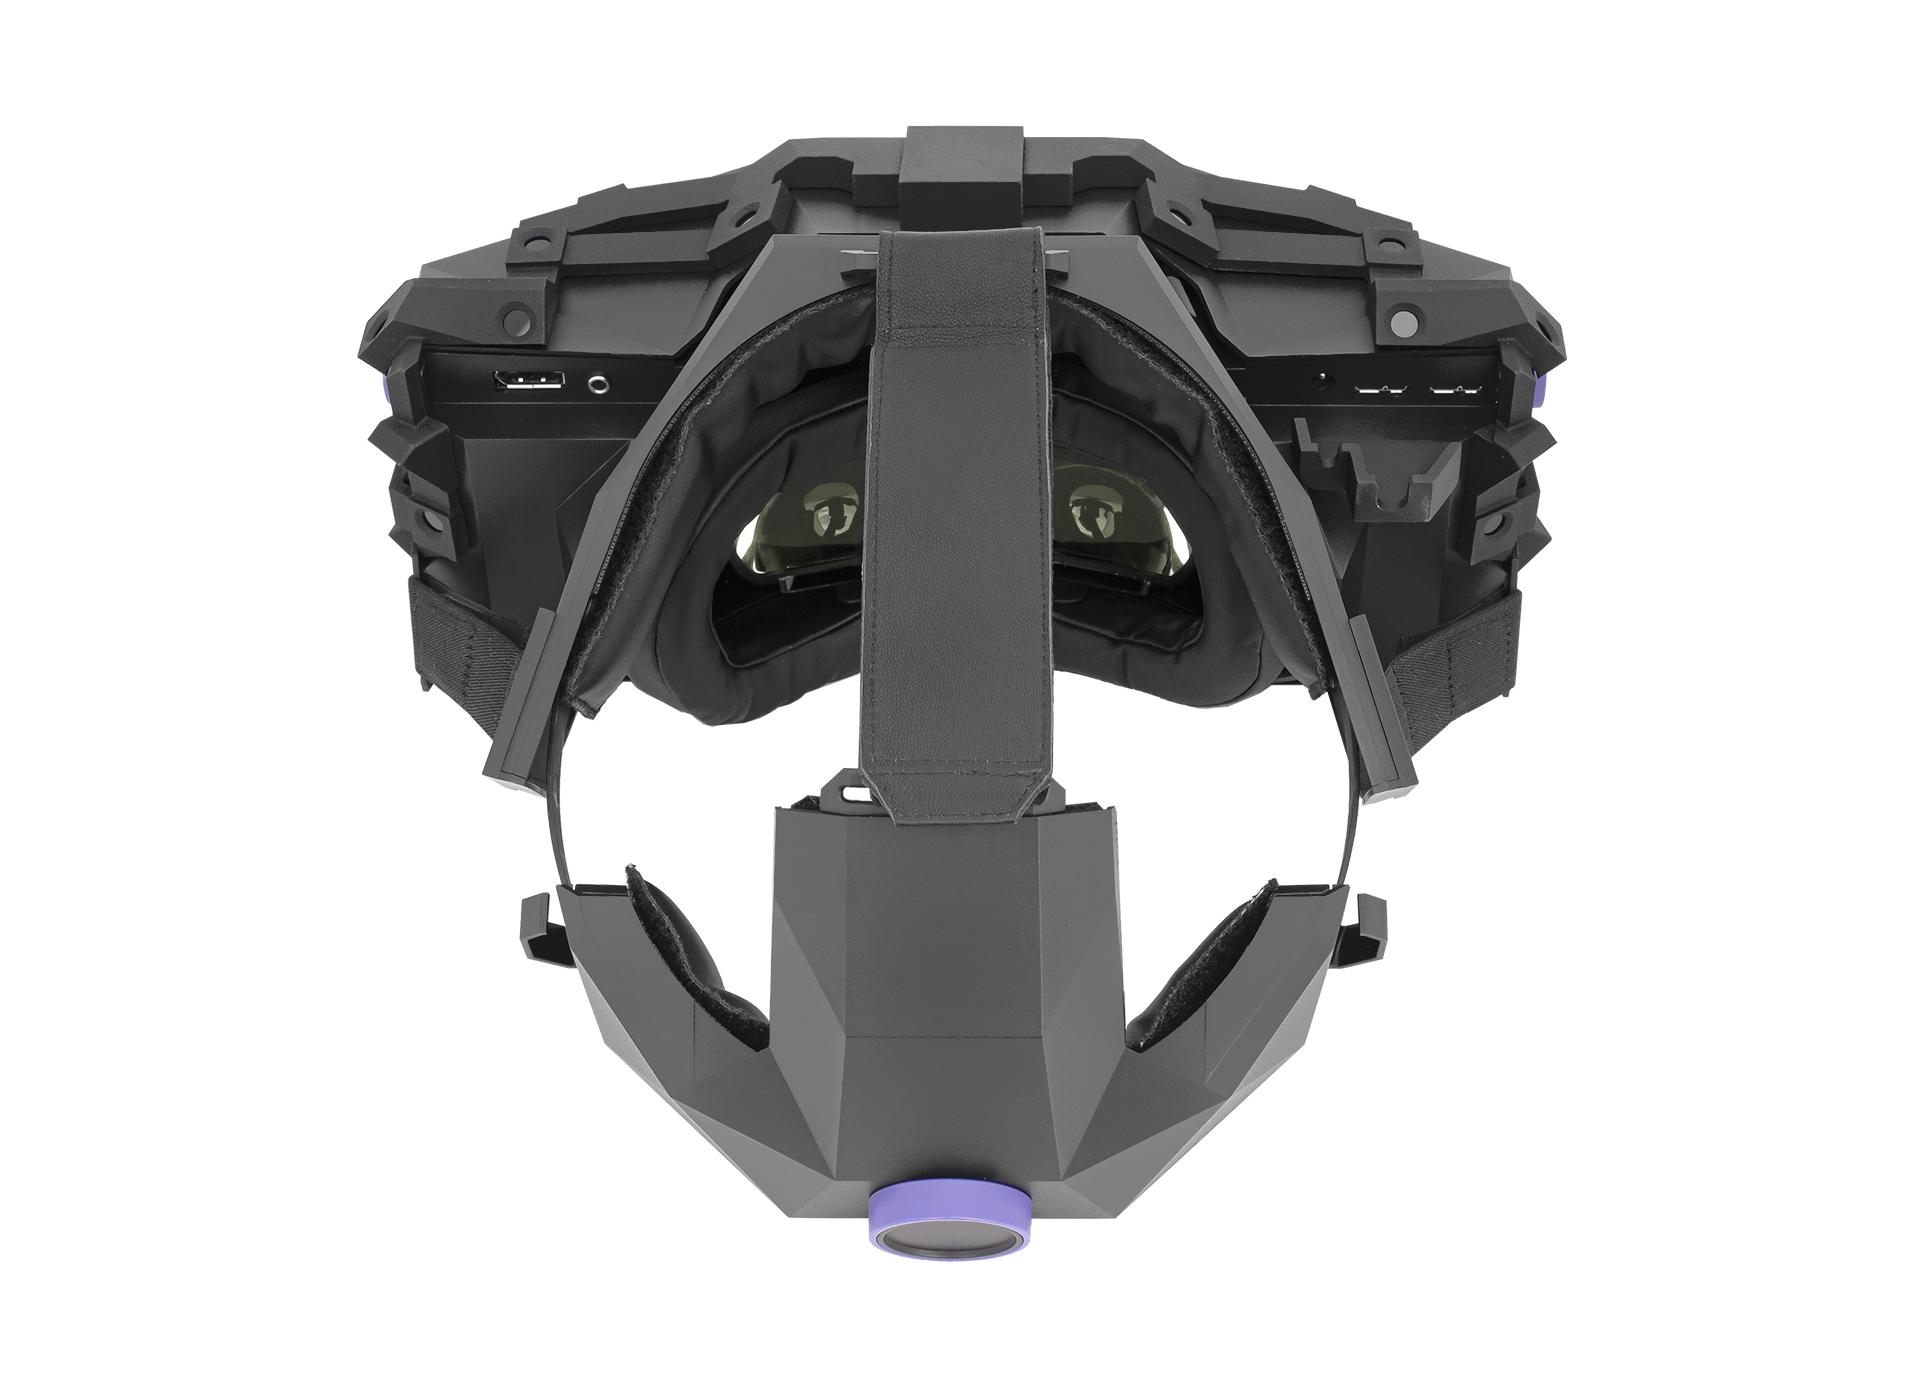 XTAL 5K high-end VR headset top head-strap view